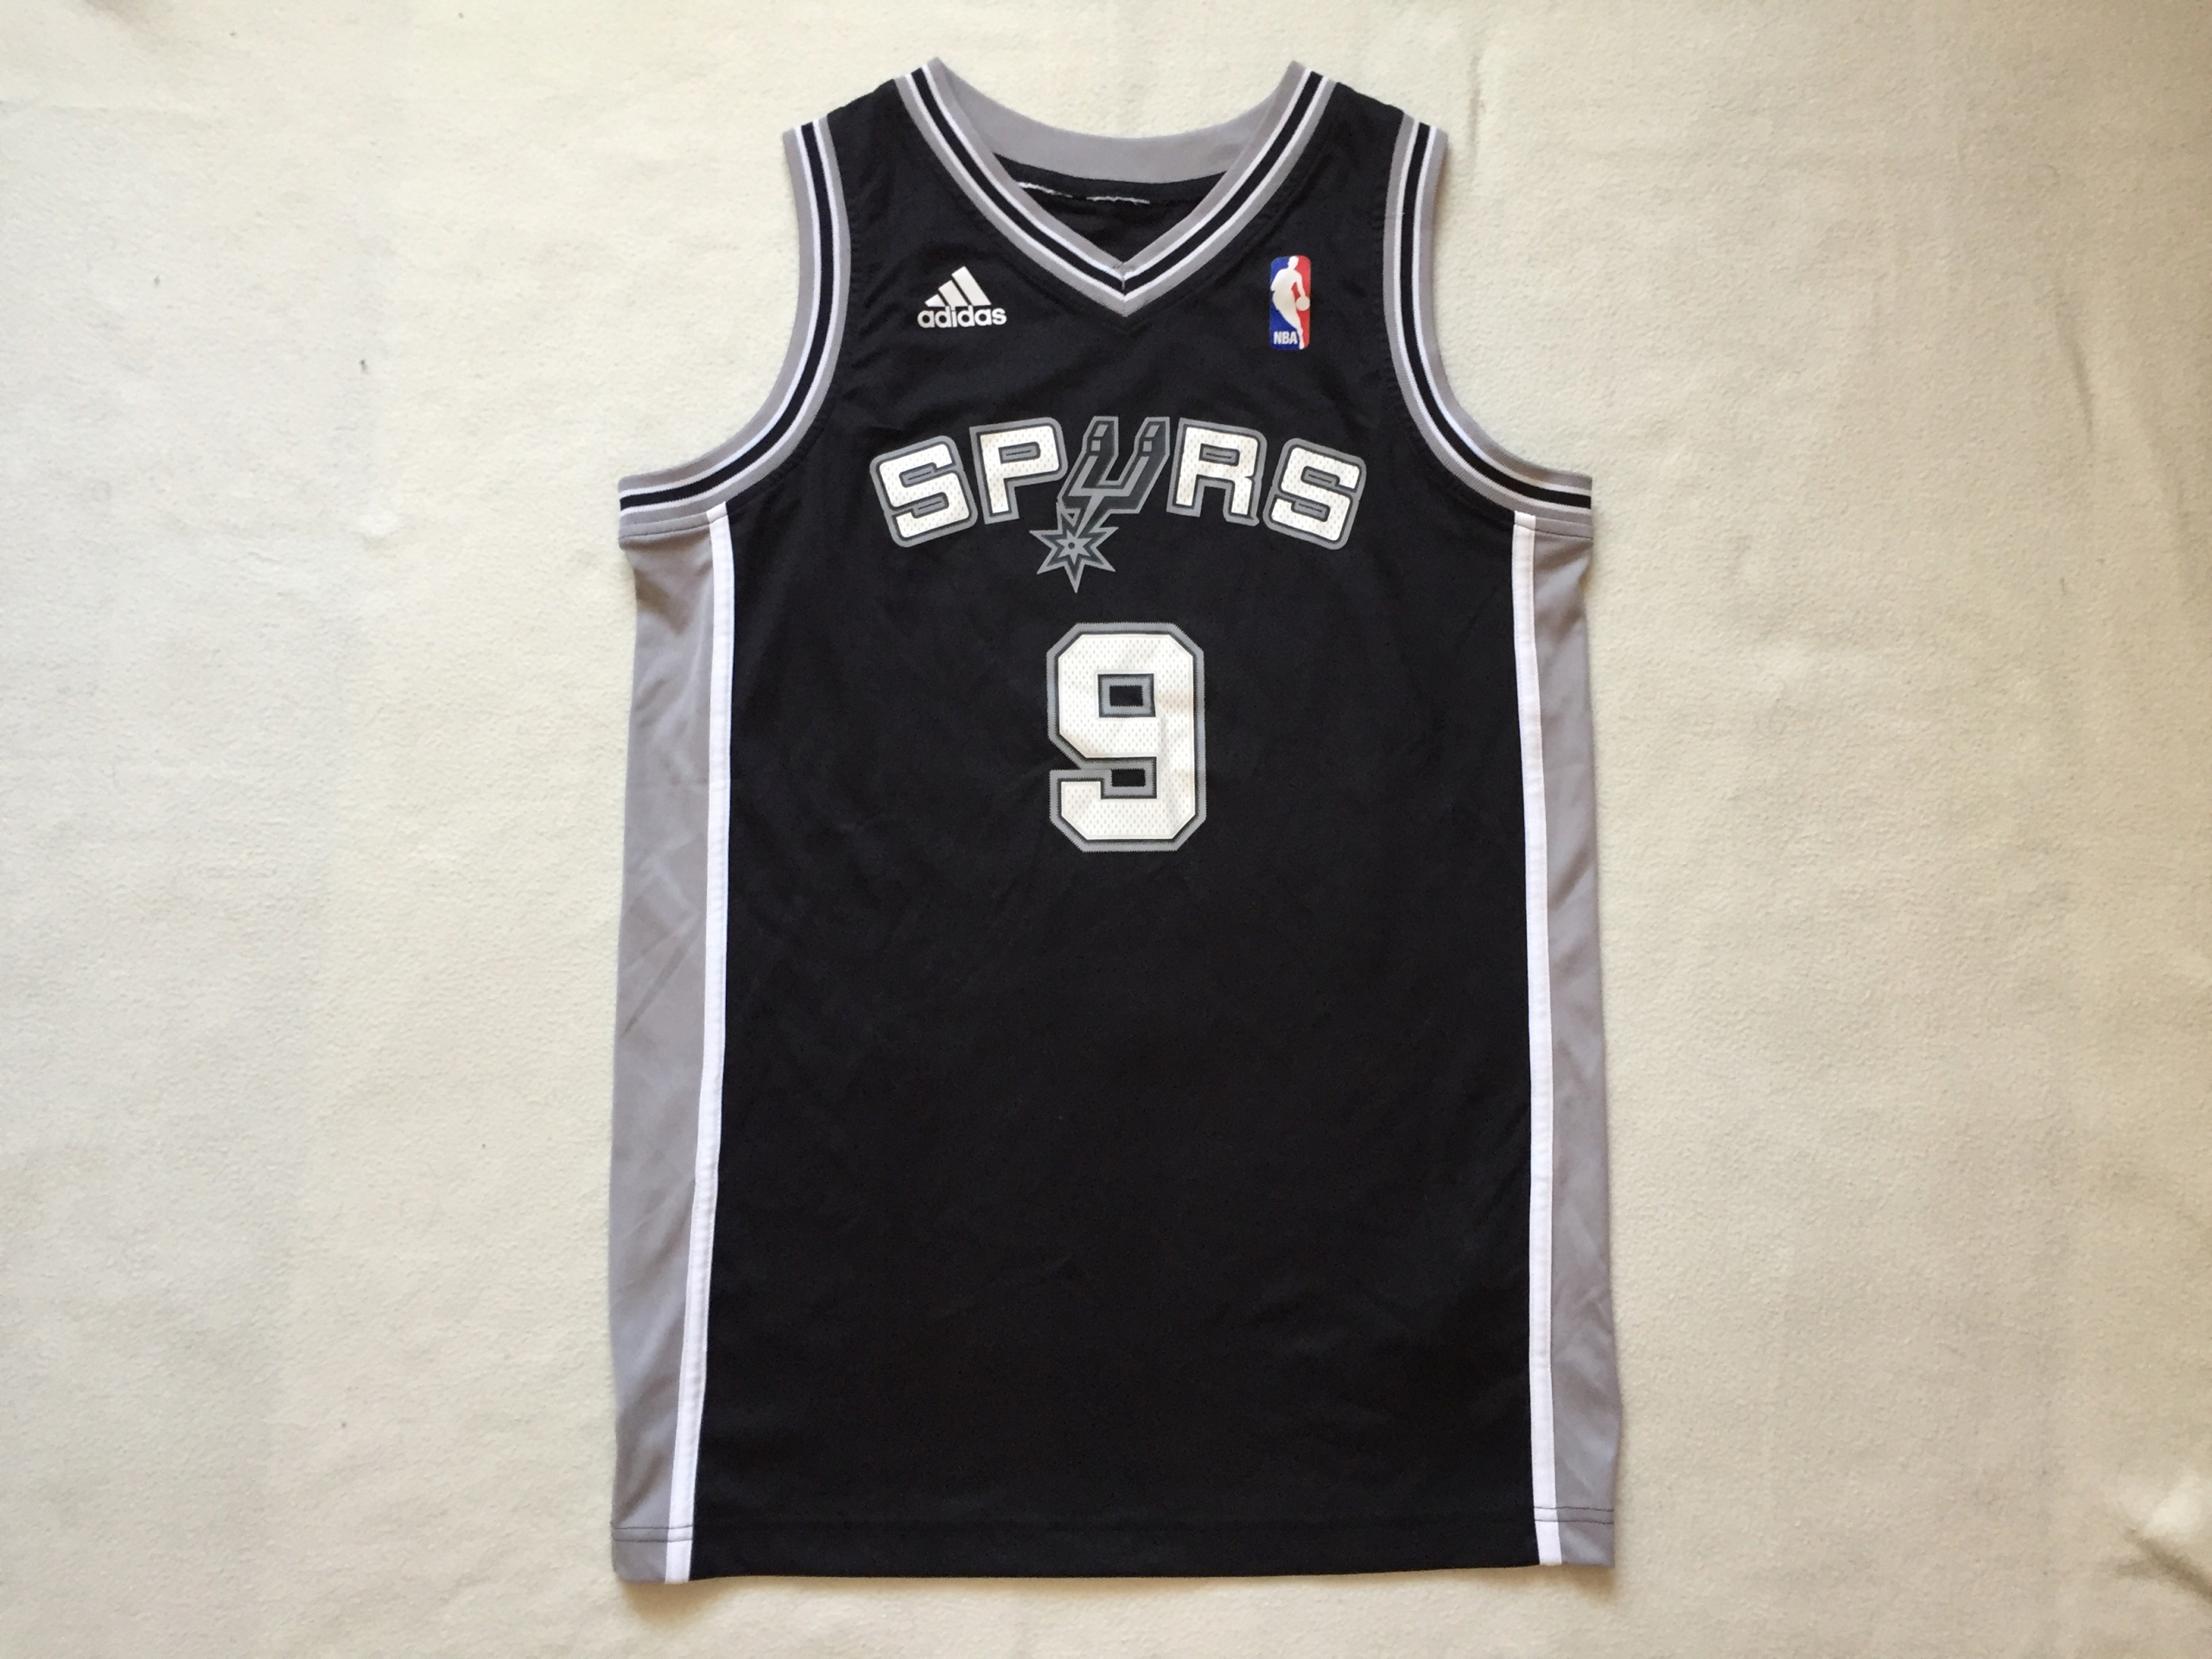 Koszulka NBA San Antonio Spurs - Adidas